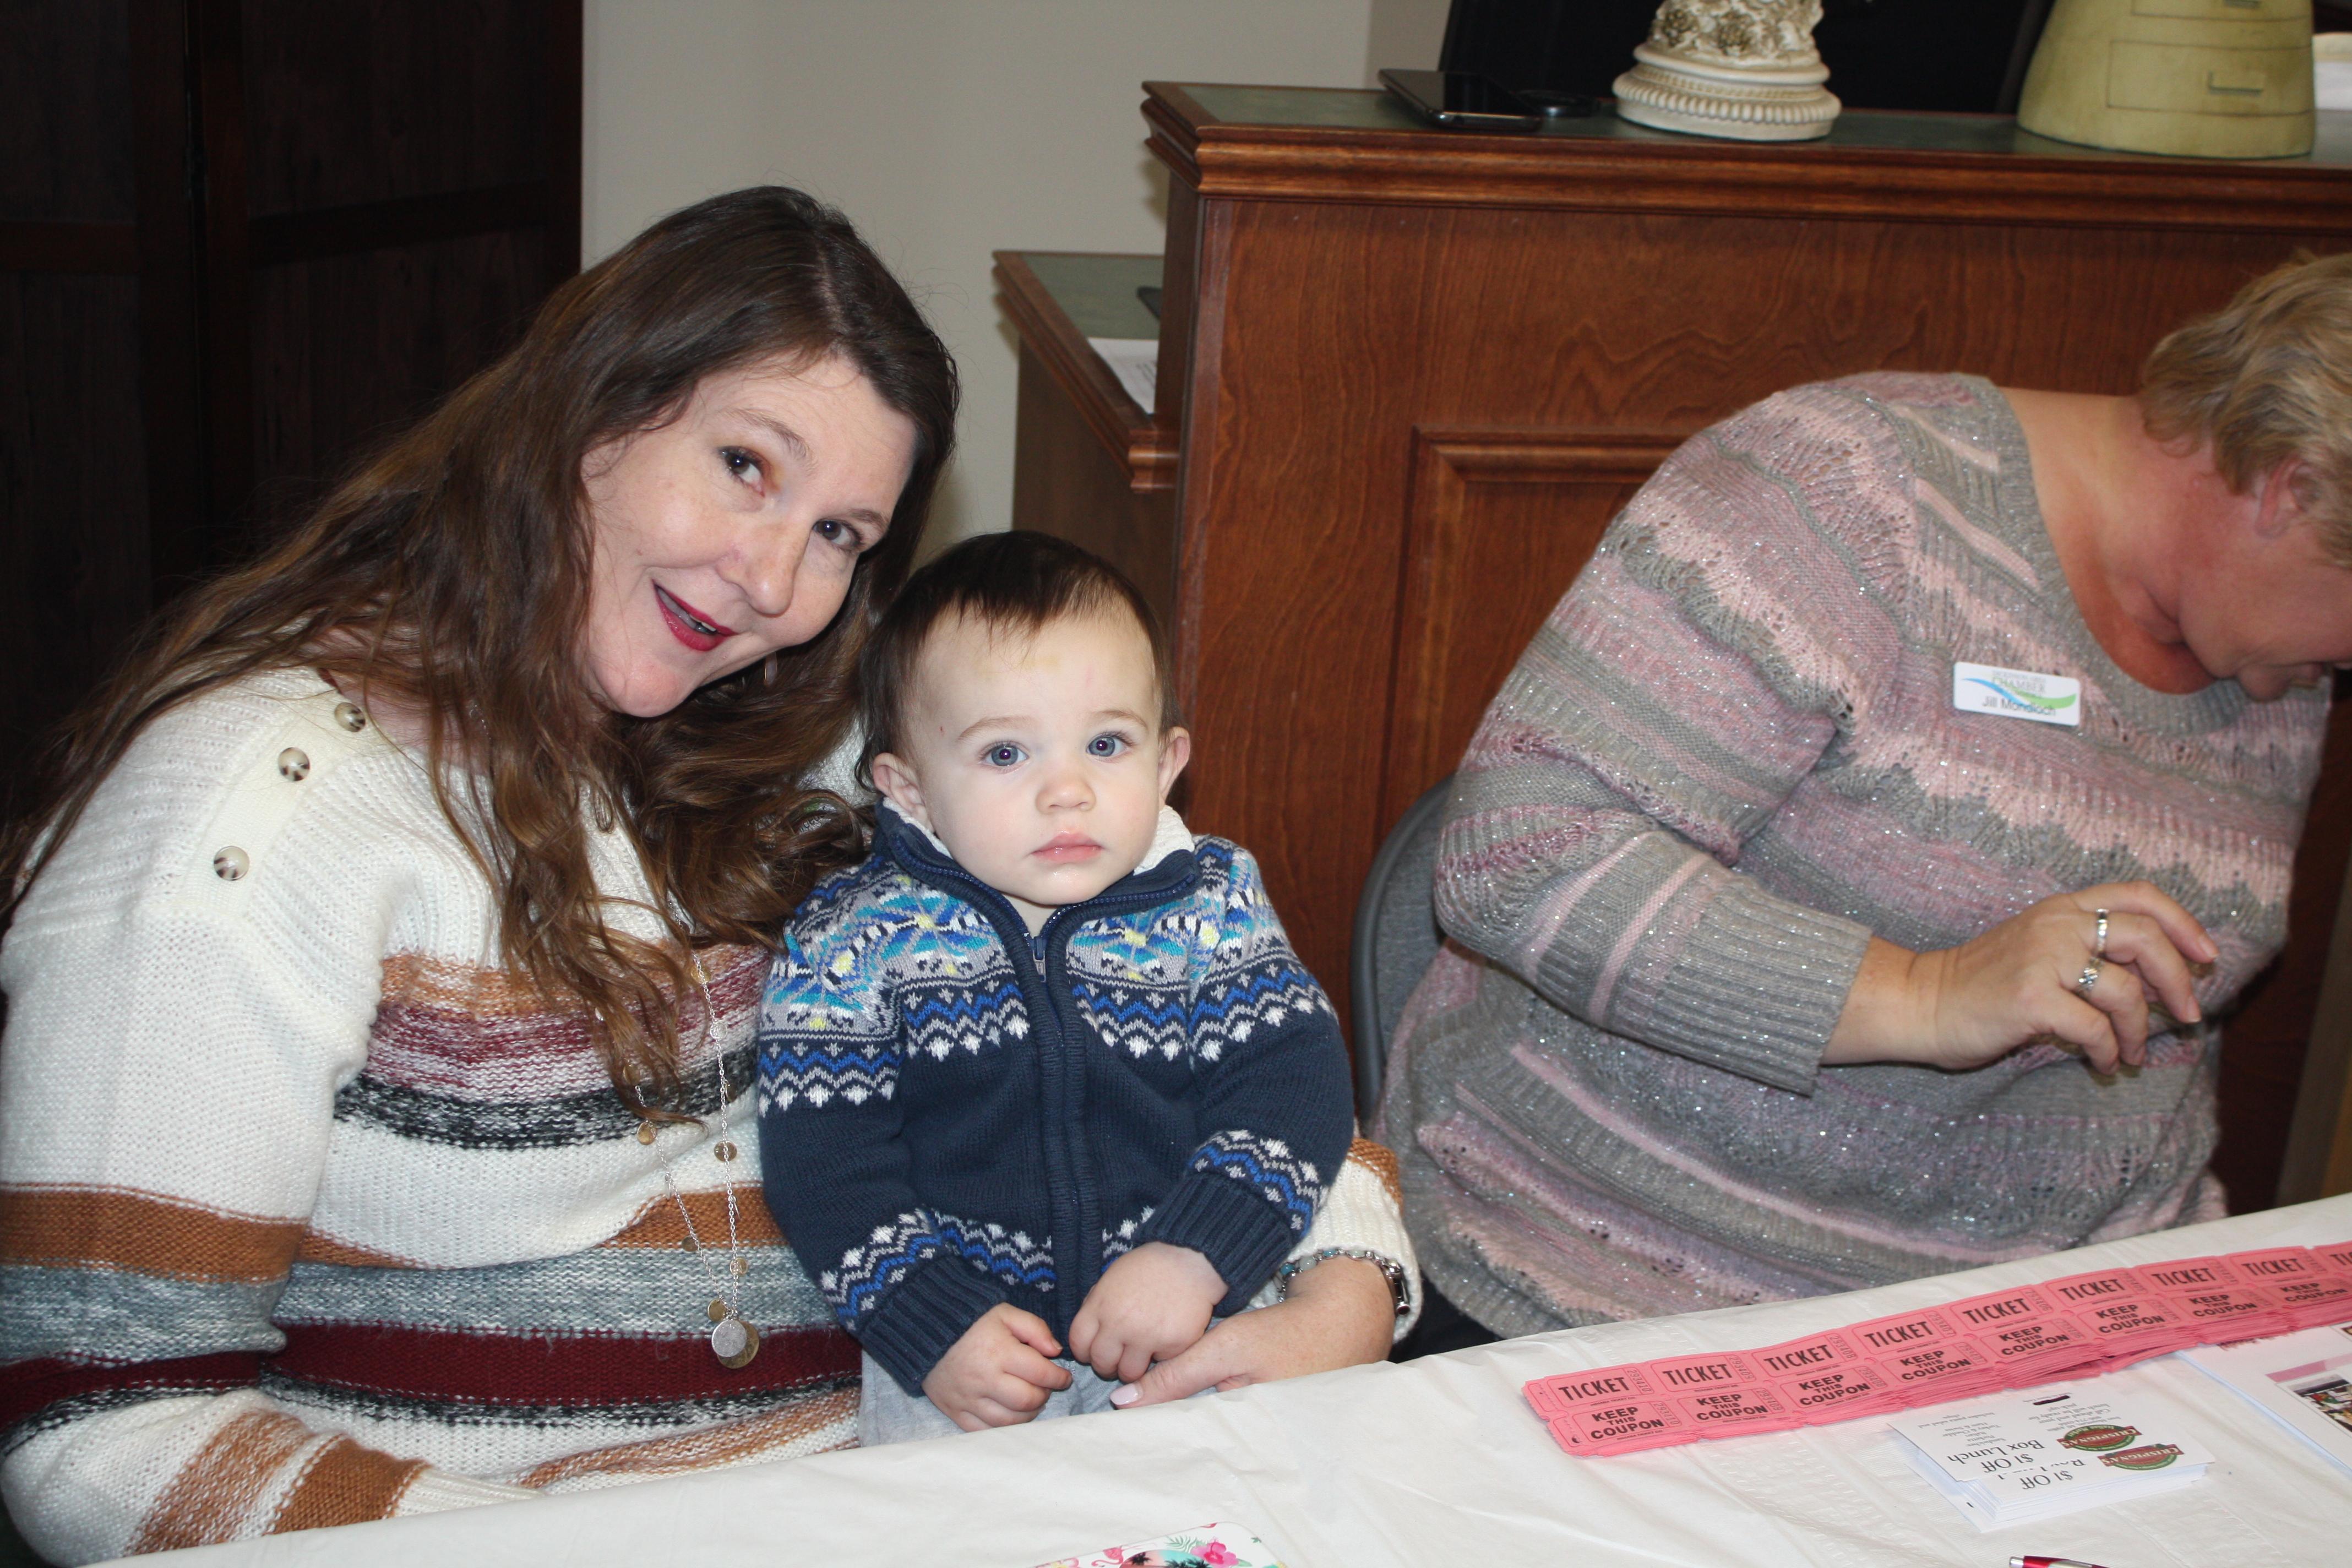 Kristine and baby